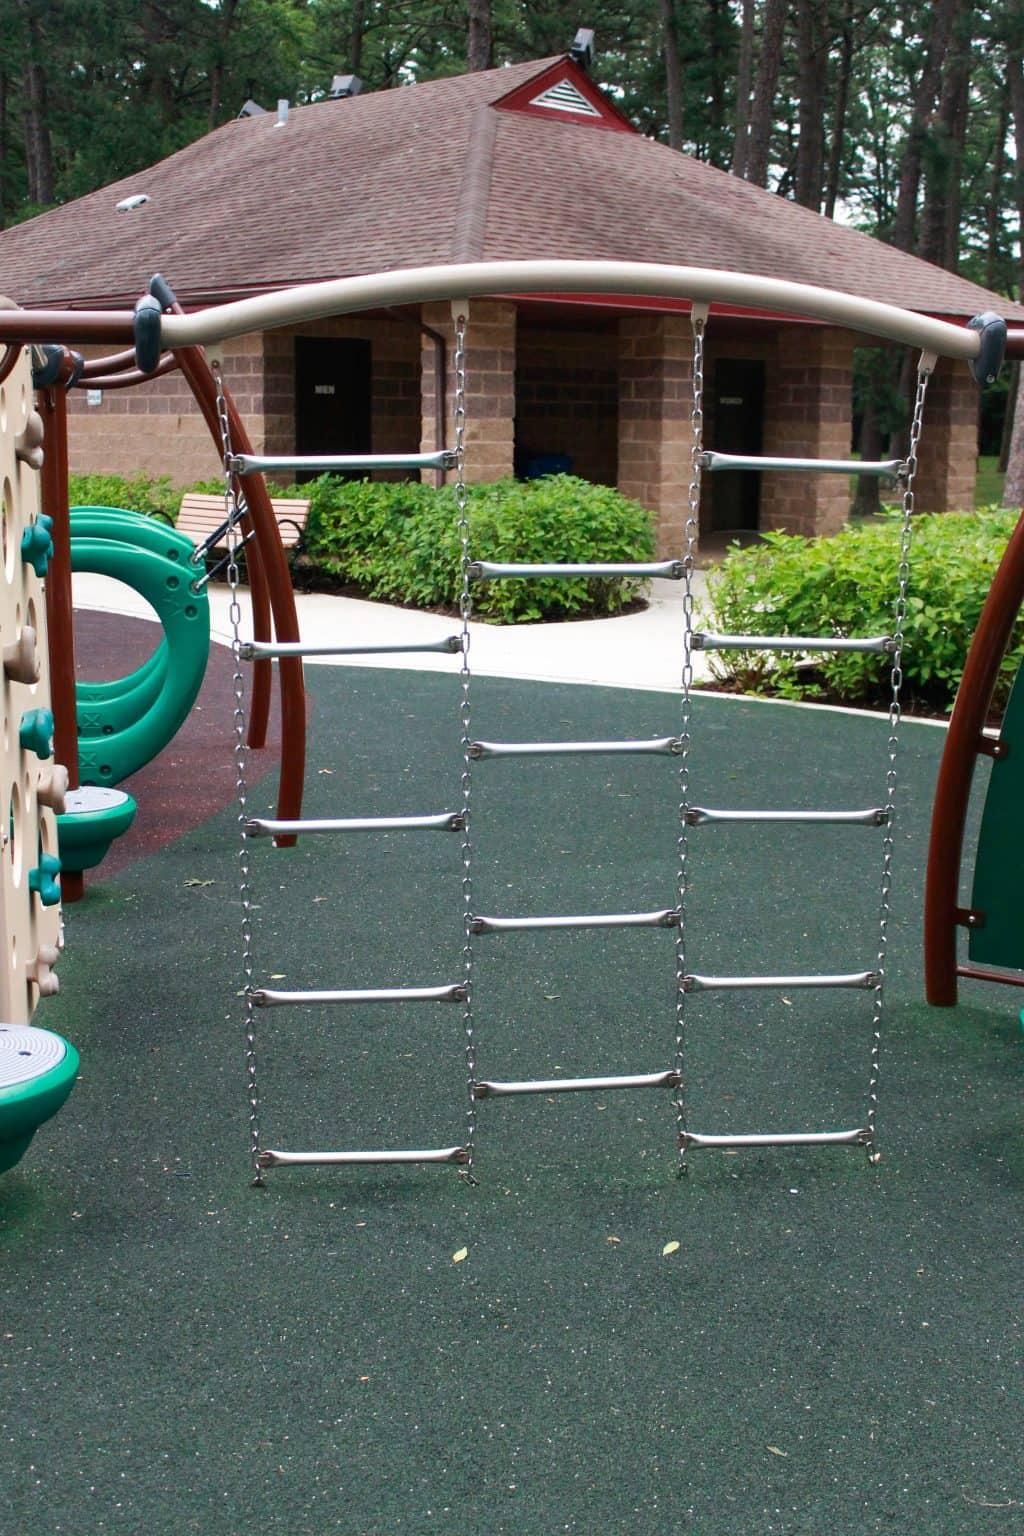 windward-beach-park-playground-brick-nj_27651422193_o-1024x1536